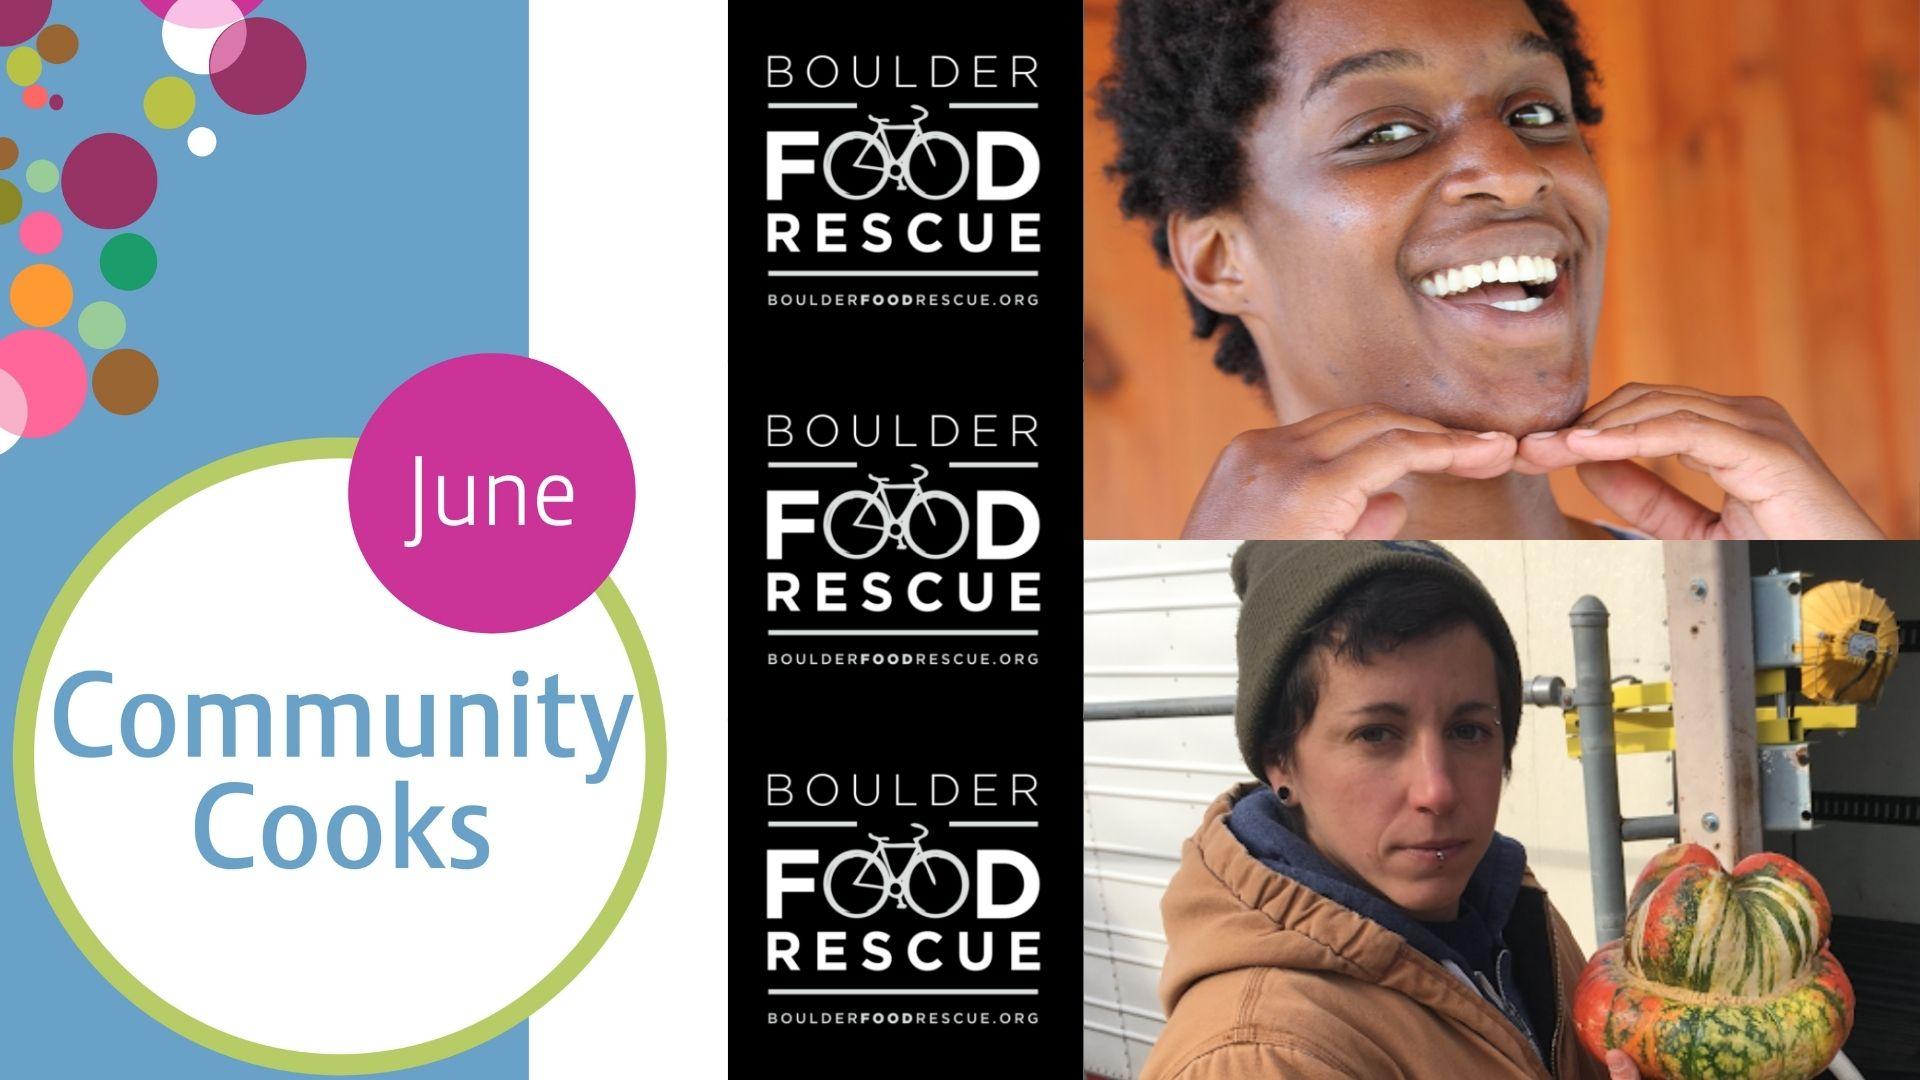 Community Cooks: Boulder Food Rescue